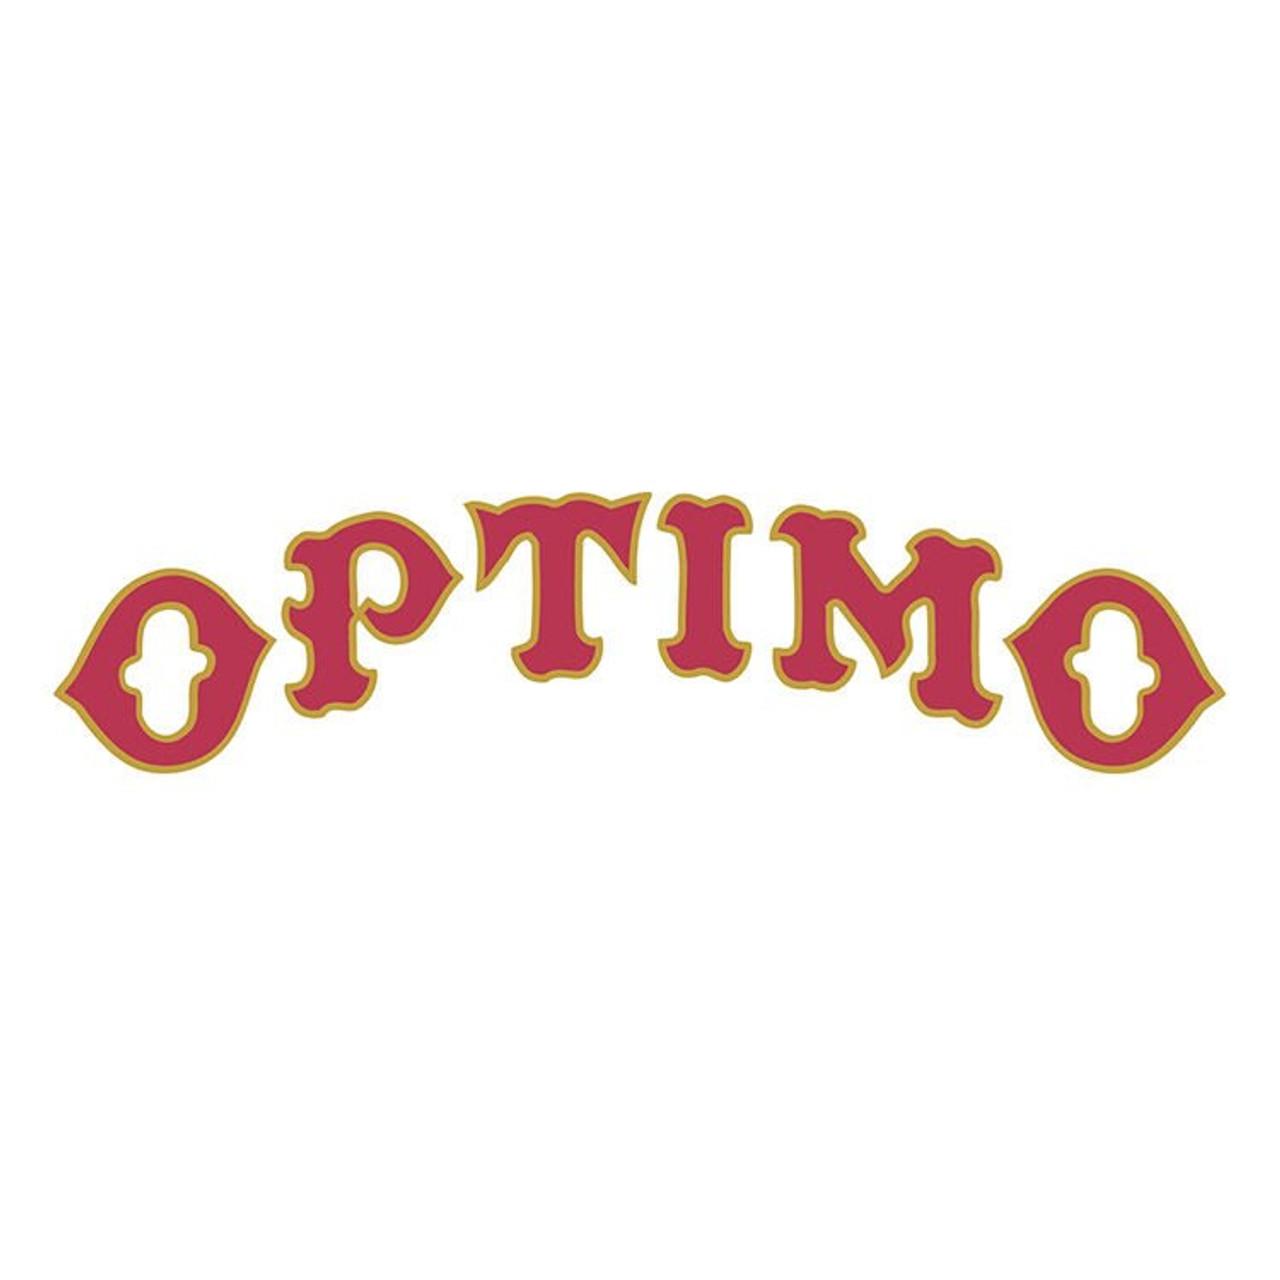 Optimo Cigars Cigarillos Silver - 4.0 x 30 (30 Packs of 2 (60 total))